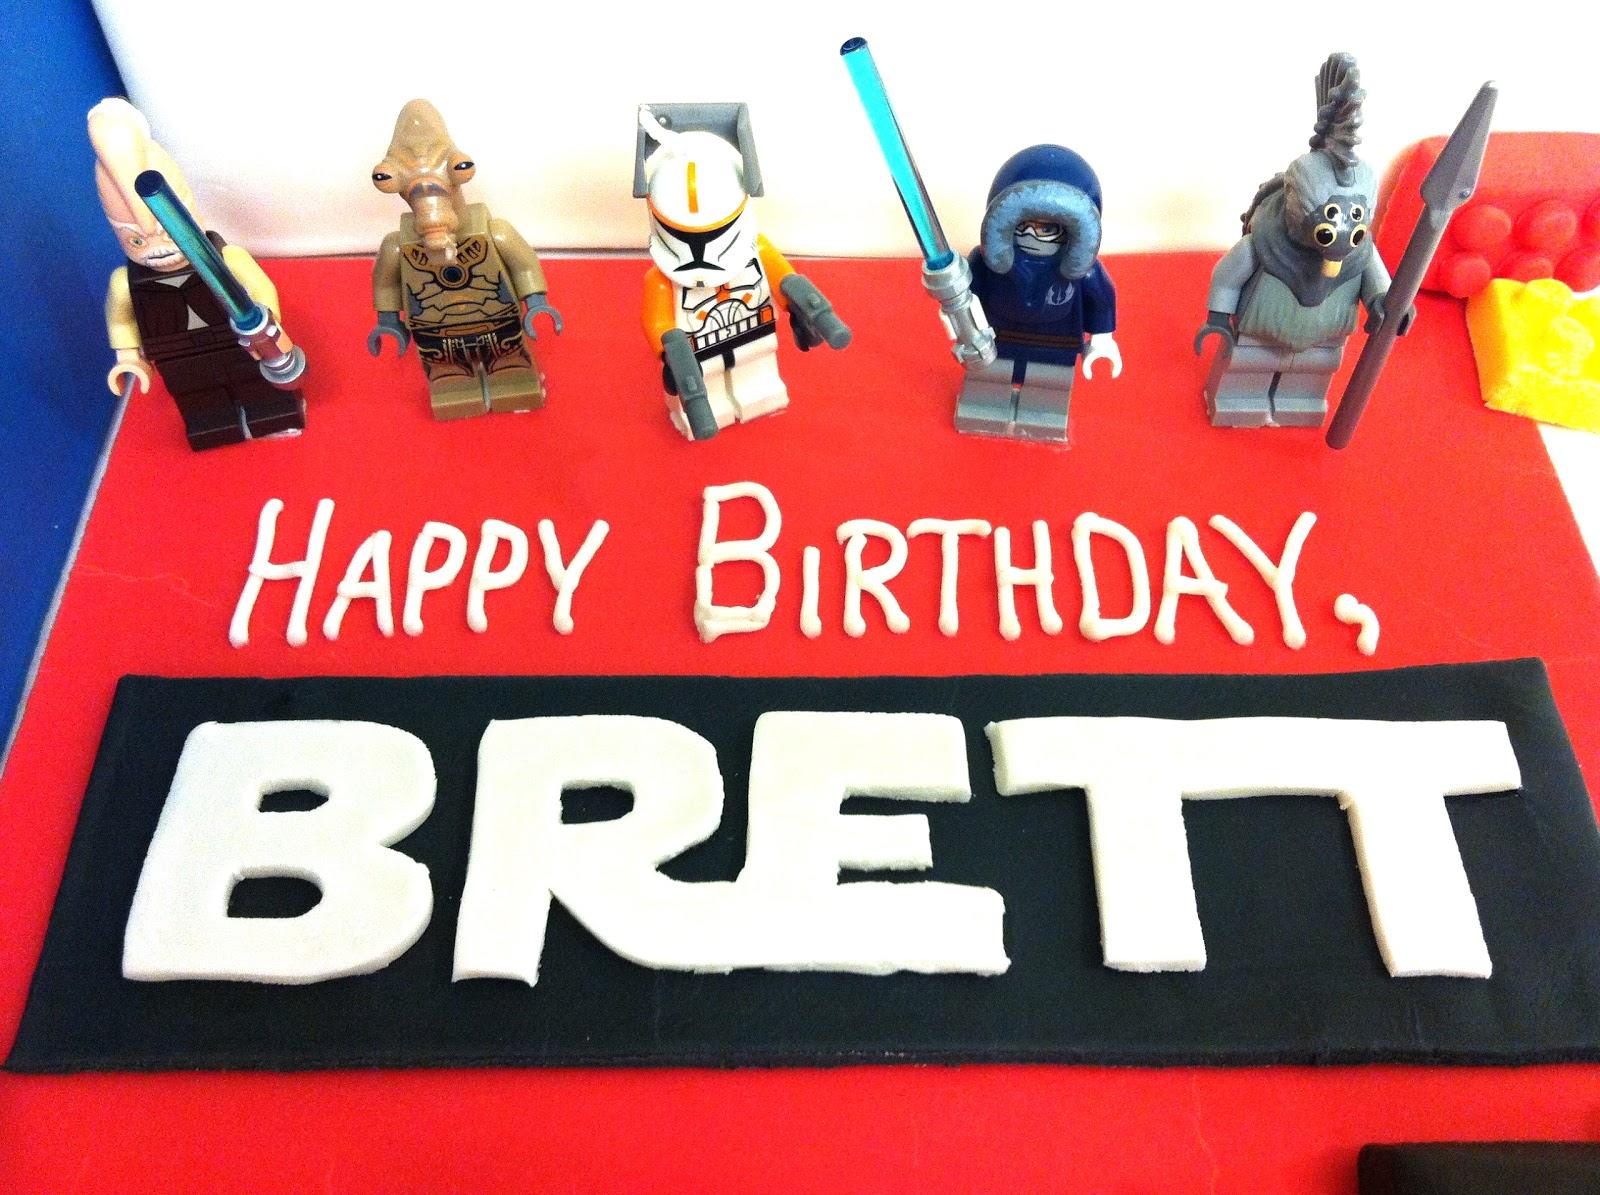 Happy Birthday Lettering Maker ~ Star wars font happy birthday imgkid the image kid has it